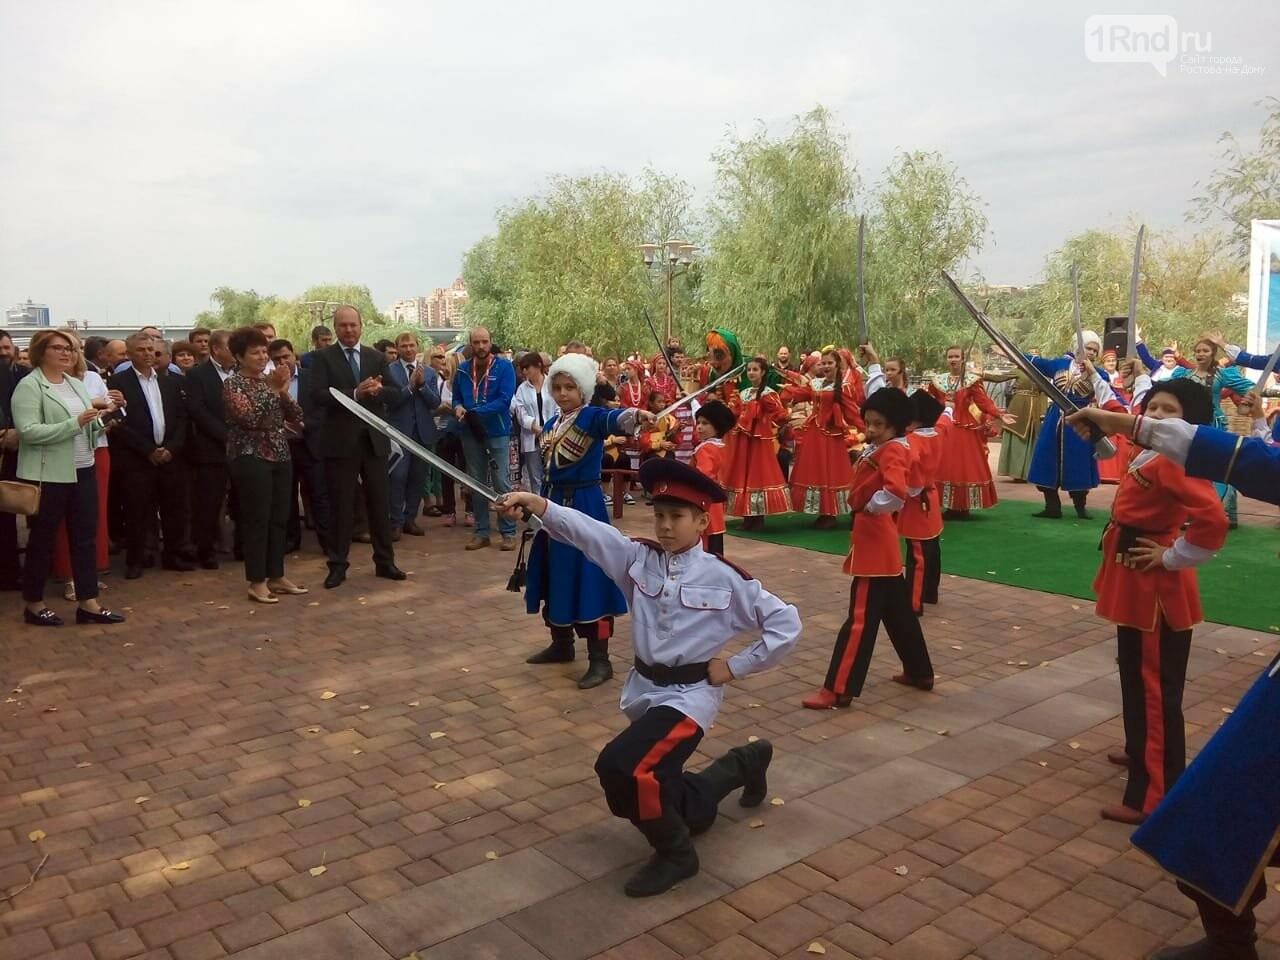 Видео дня: Виталий Кушнарев сыграл в баскетбол на открытии дня города в Ростове, фото-1, Фото: Анна Дунаева / 1rnd.ru